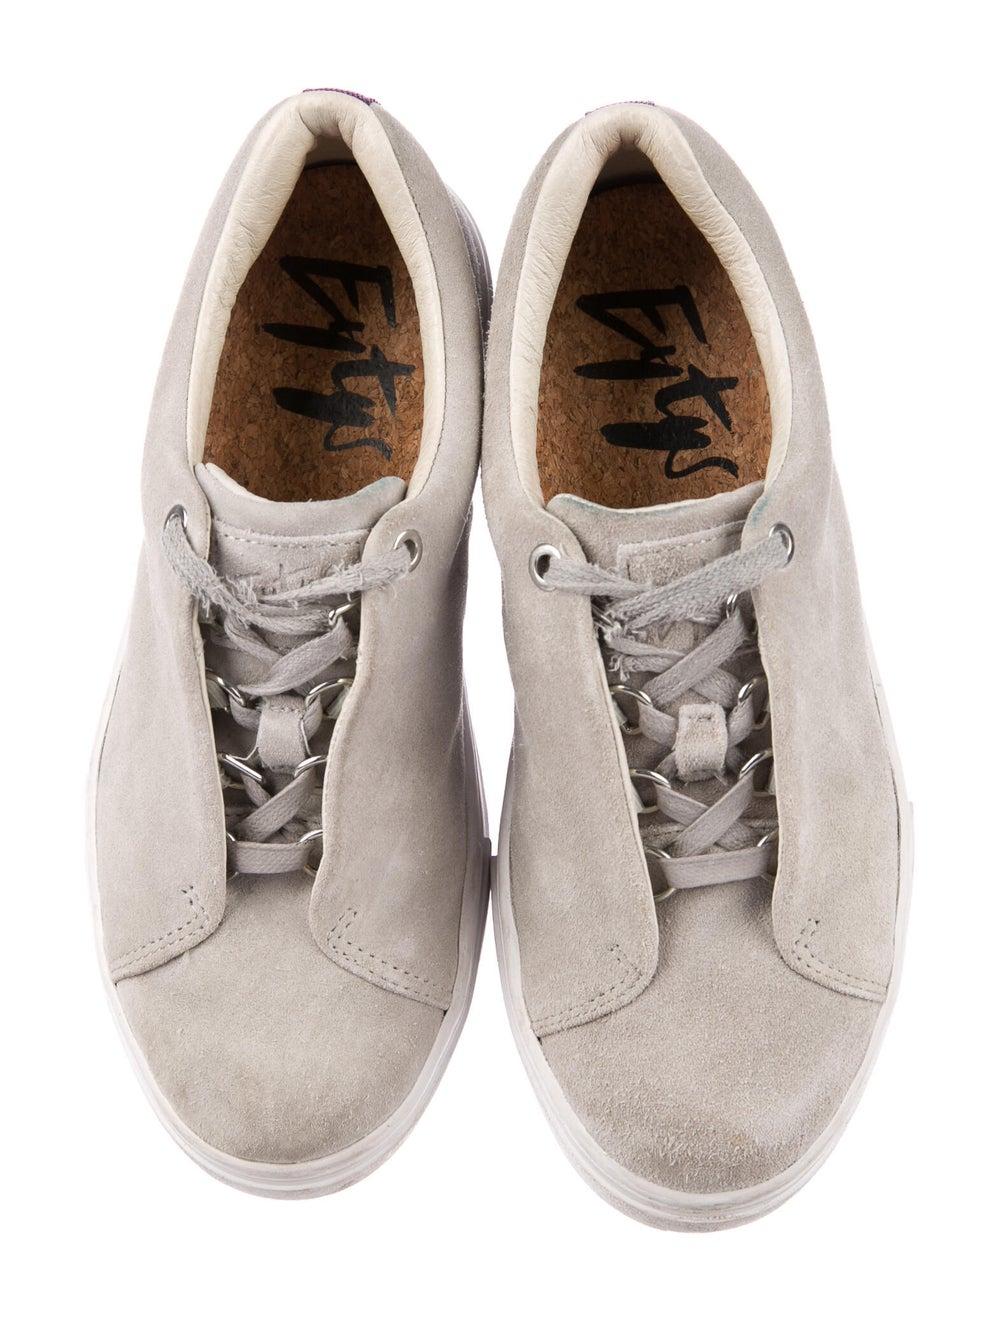 Eytys Suede Sneakers Grey - image 3